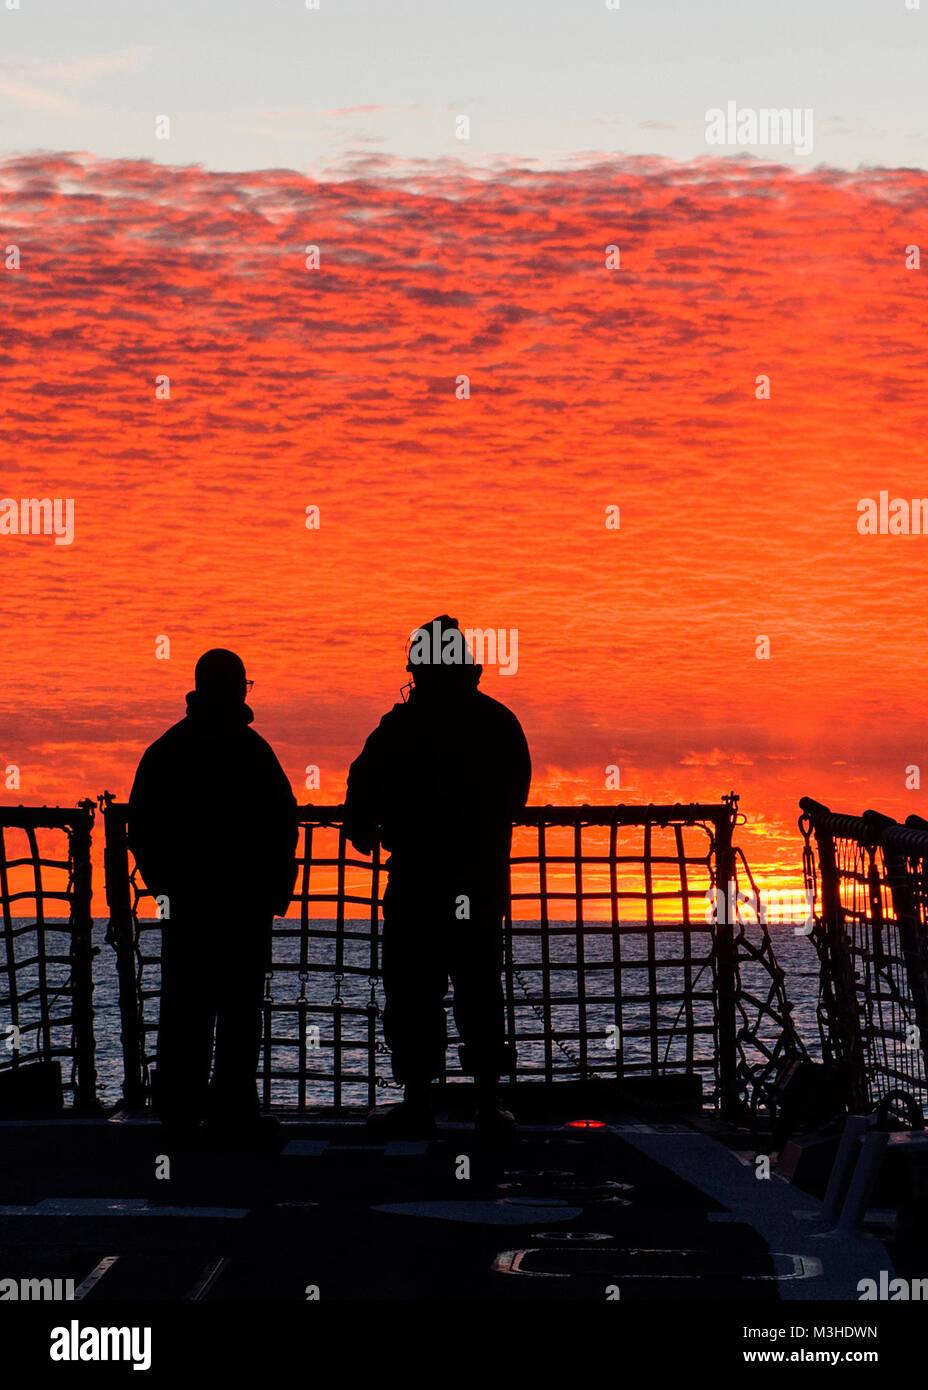 ATLANTIC OCEAN (Feb. 3, 2018) Yeoman 1st Class James Gray, left, and Yeoman 2nd Class Kobi Gaskin watch the sunset - Stock Image